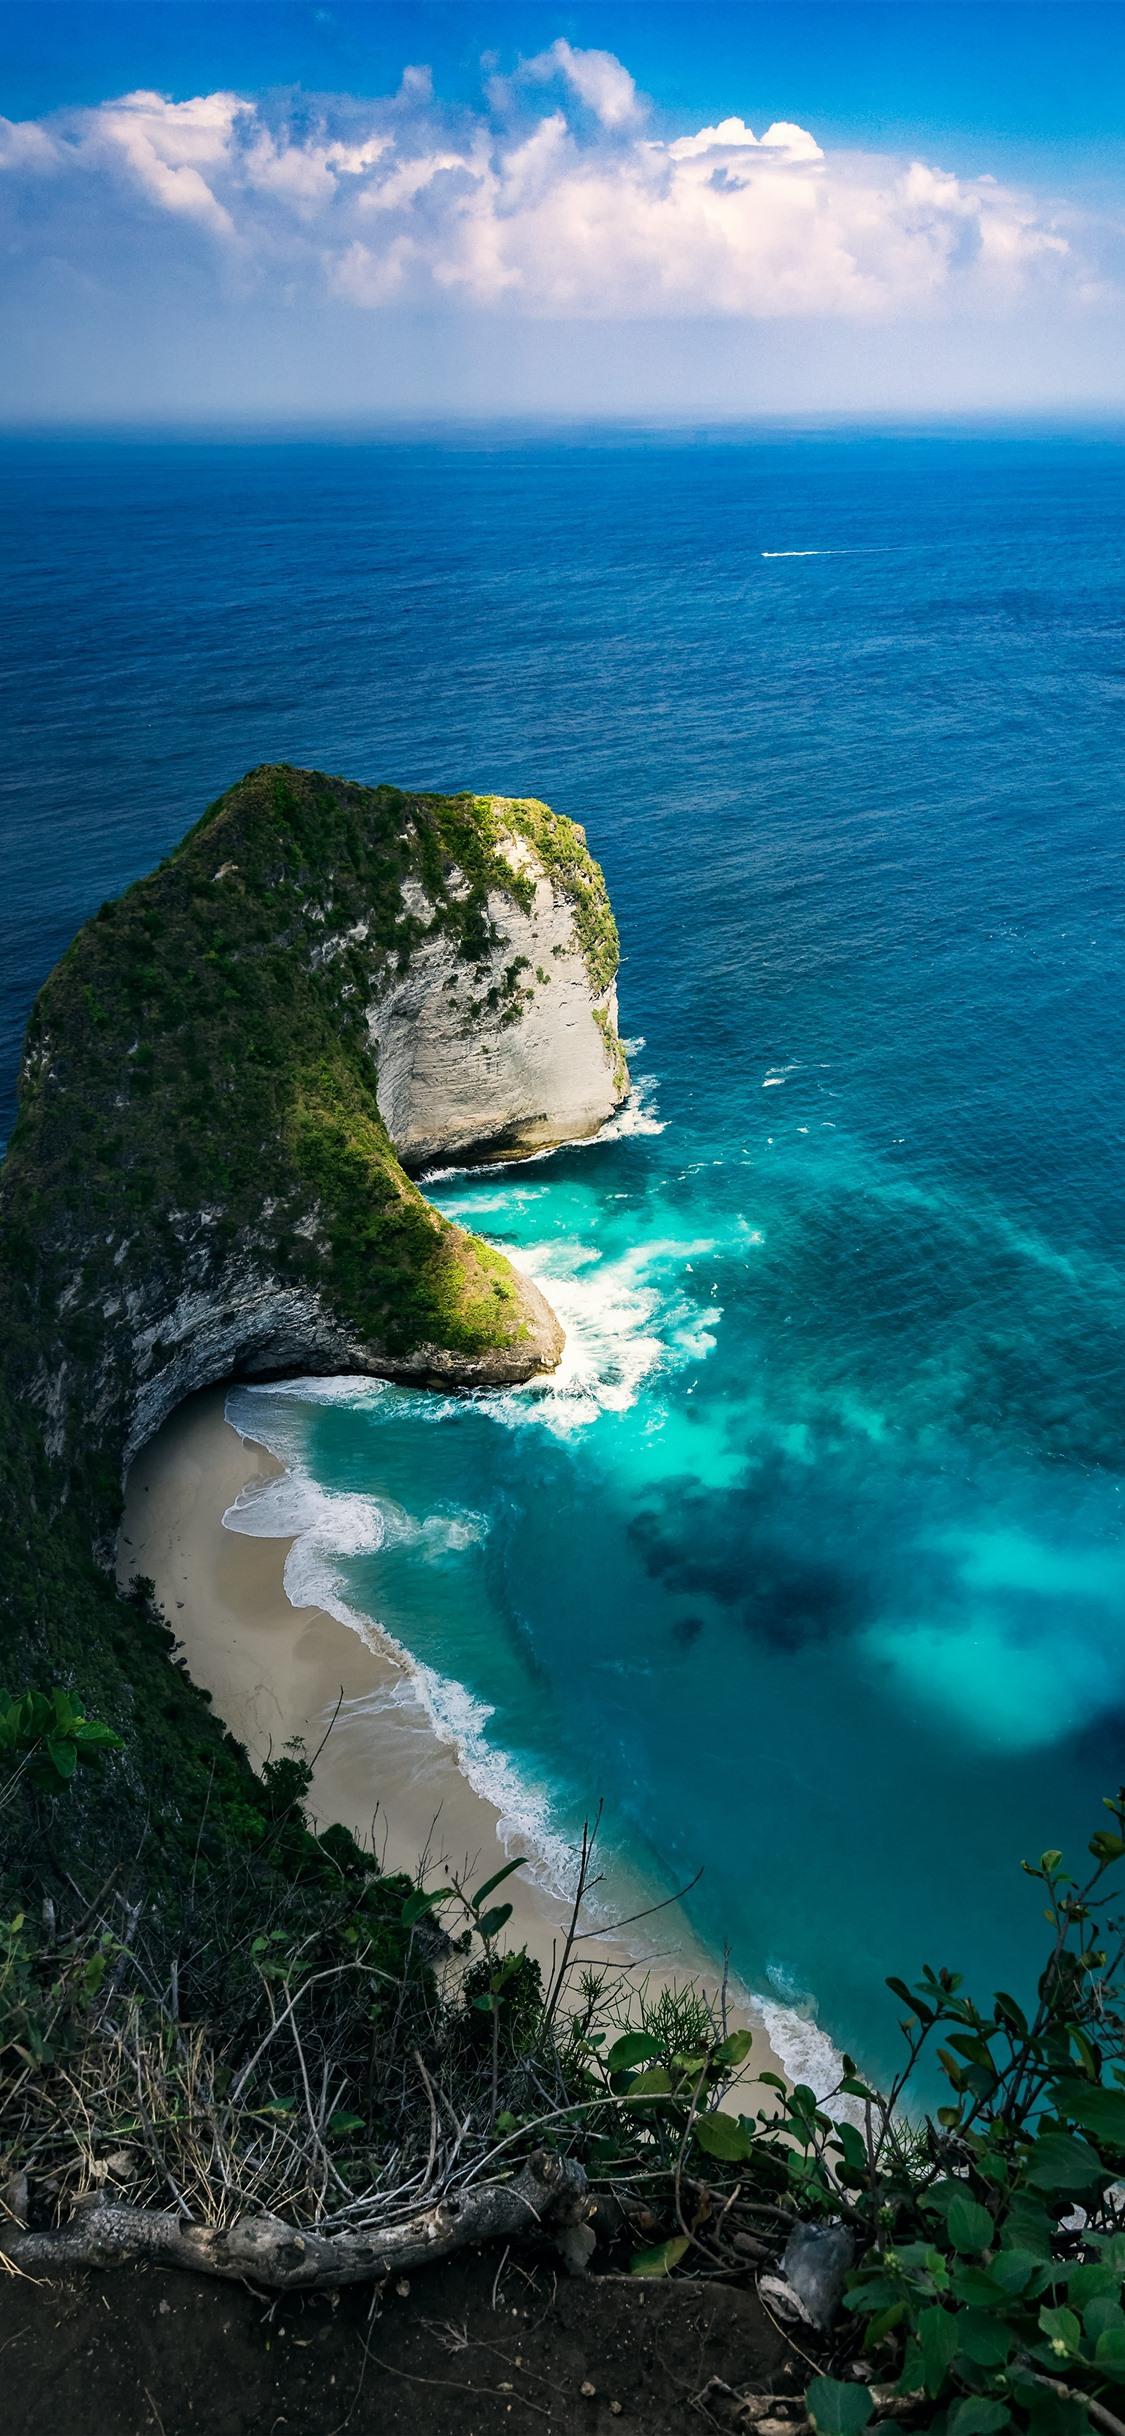 Wallpaper Beautiful Nature Landscape Blue Sea Beach